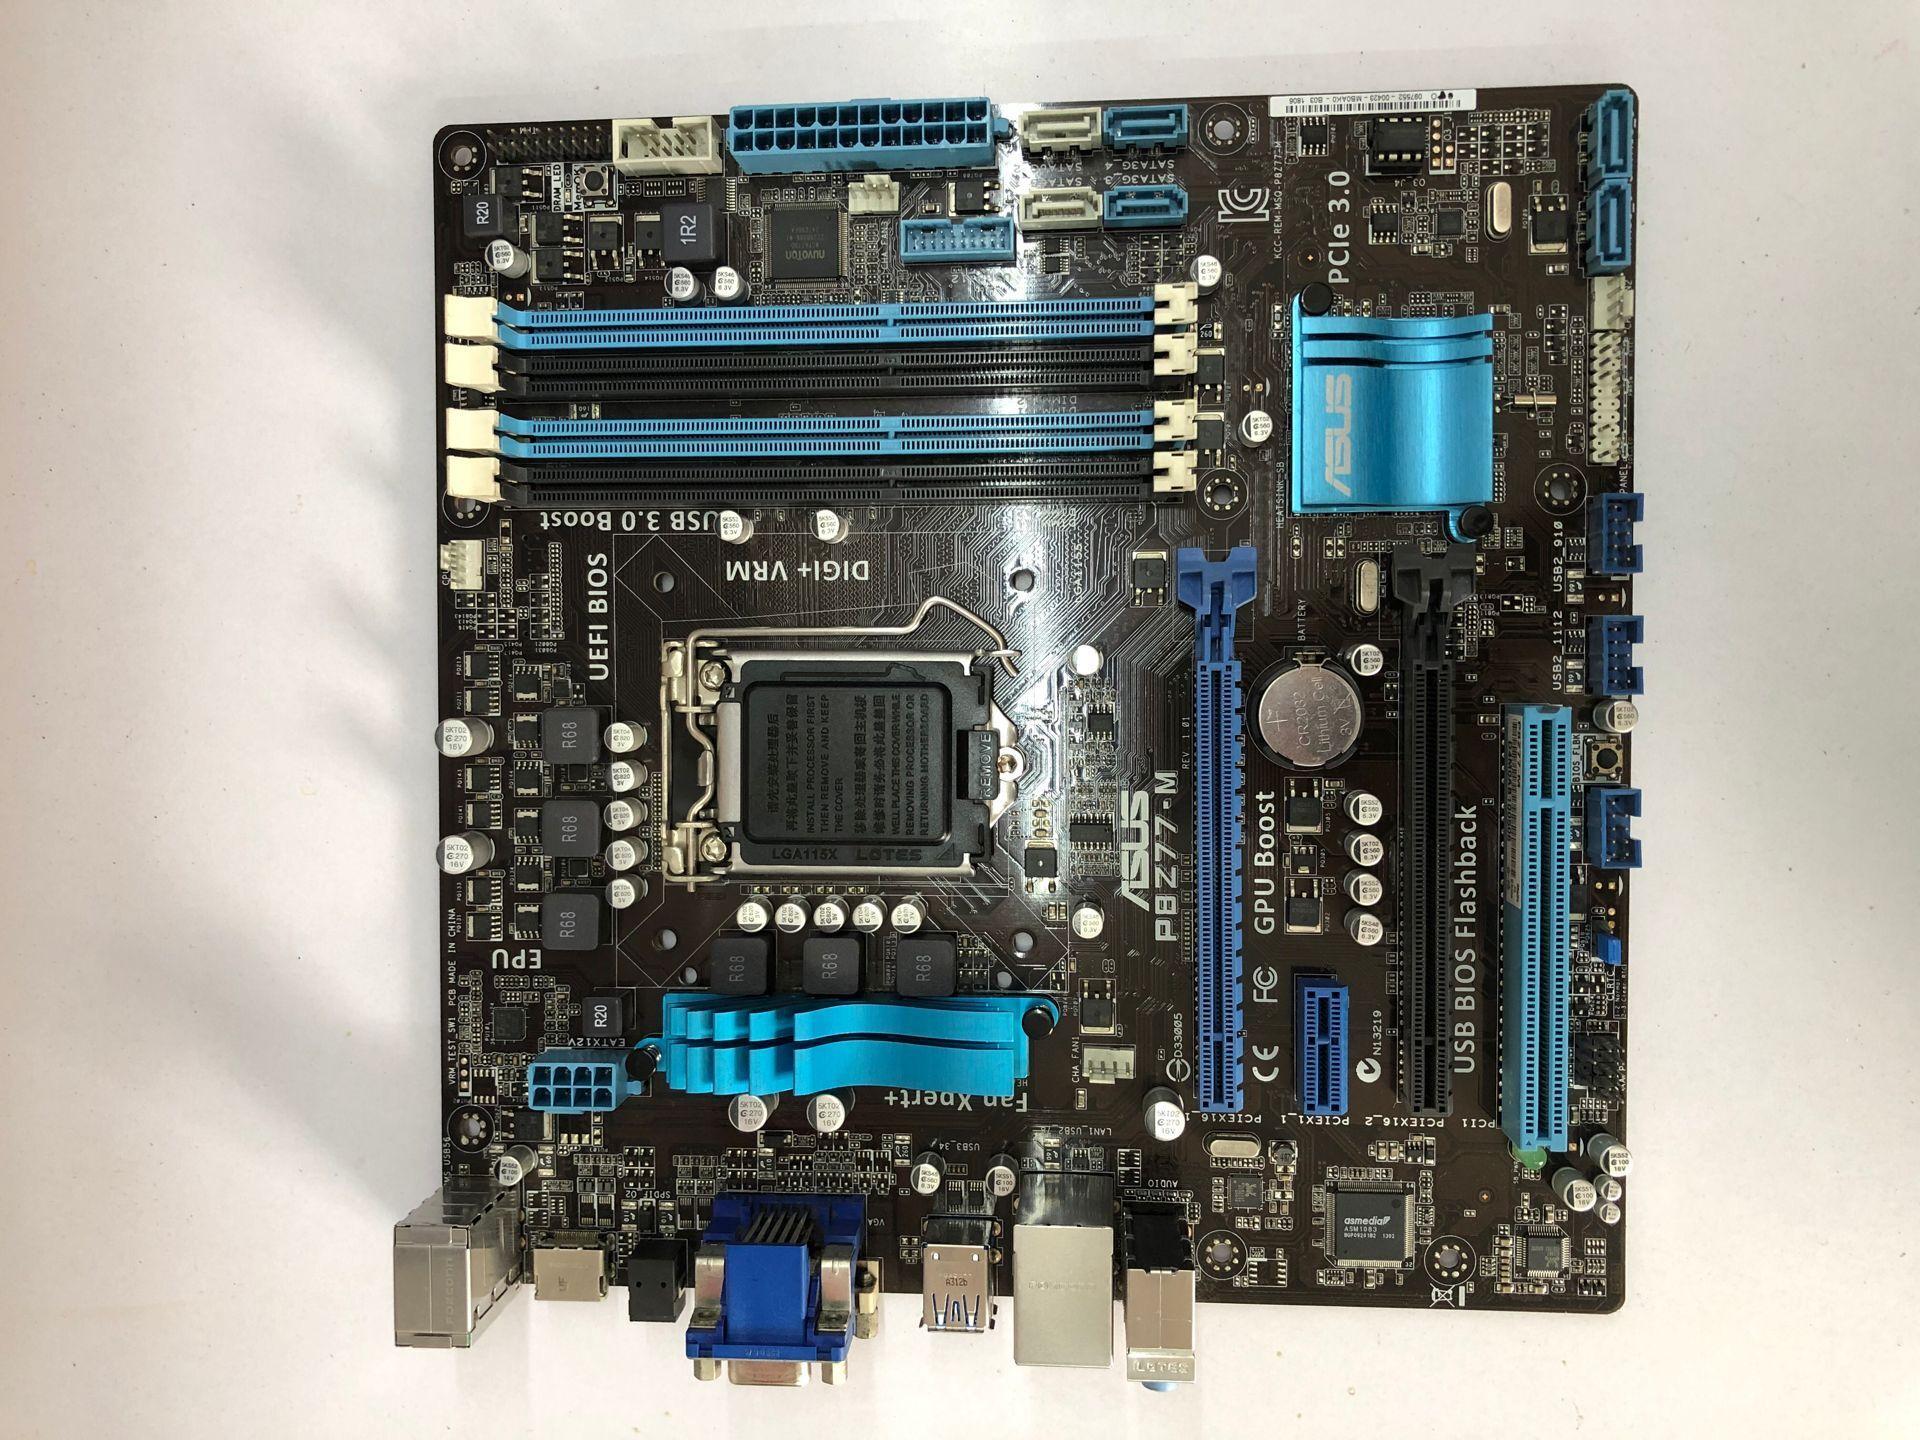 IO 쉴드 지원 P8Z77-M 데스크탑 메인 보드 Z77 마더 보드 LGA 1155 LGA1155 S1155 소켓 1155 USB3.0의 PCIE 3.0 16 배속 22 나노 CPU를